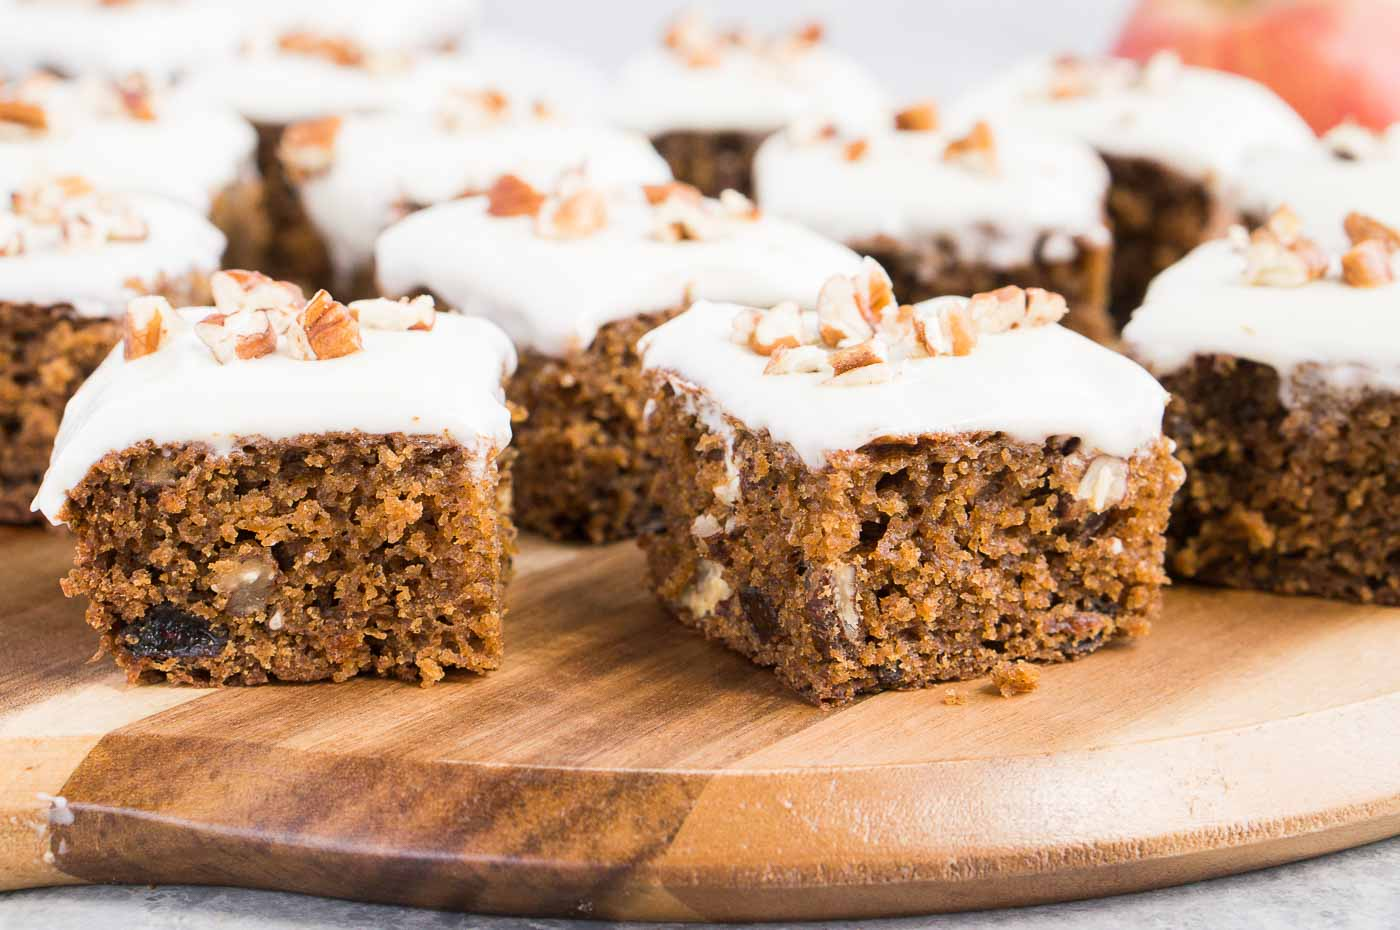 bites of applesauce cake